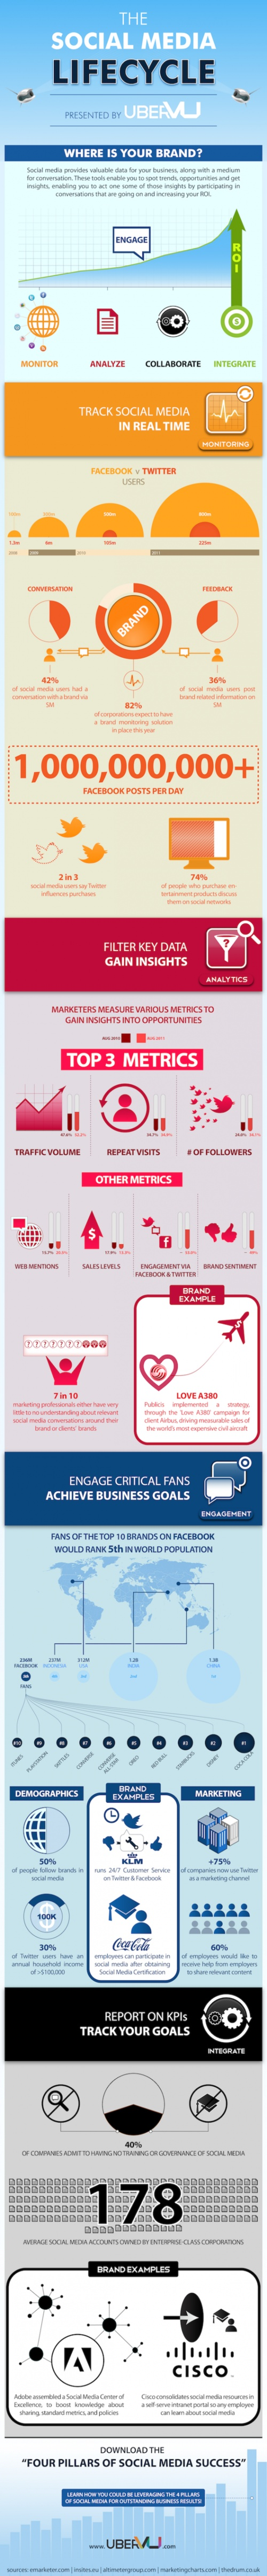 Social Media LifycycleCycle, Media Lifecycle, Life, Social Media, Life Cycling, Lifecycle Infographic, Life Cycles, El Ciclo, Socialmedia Infographic